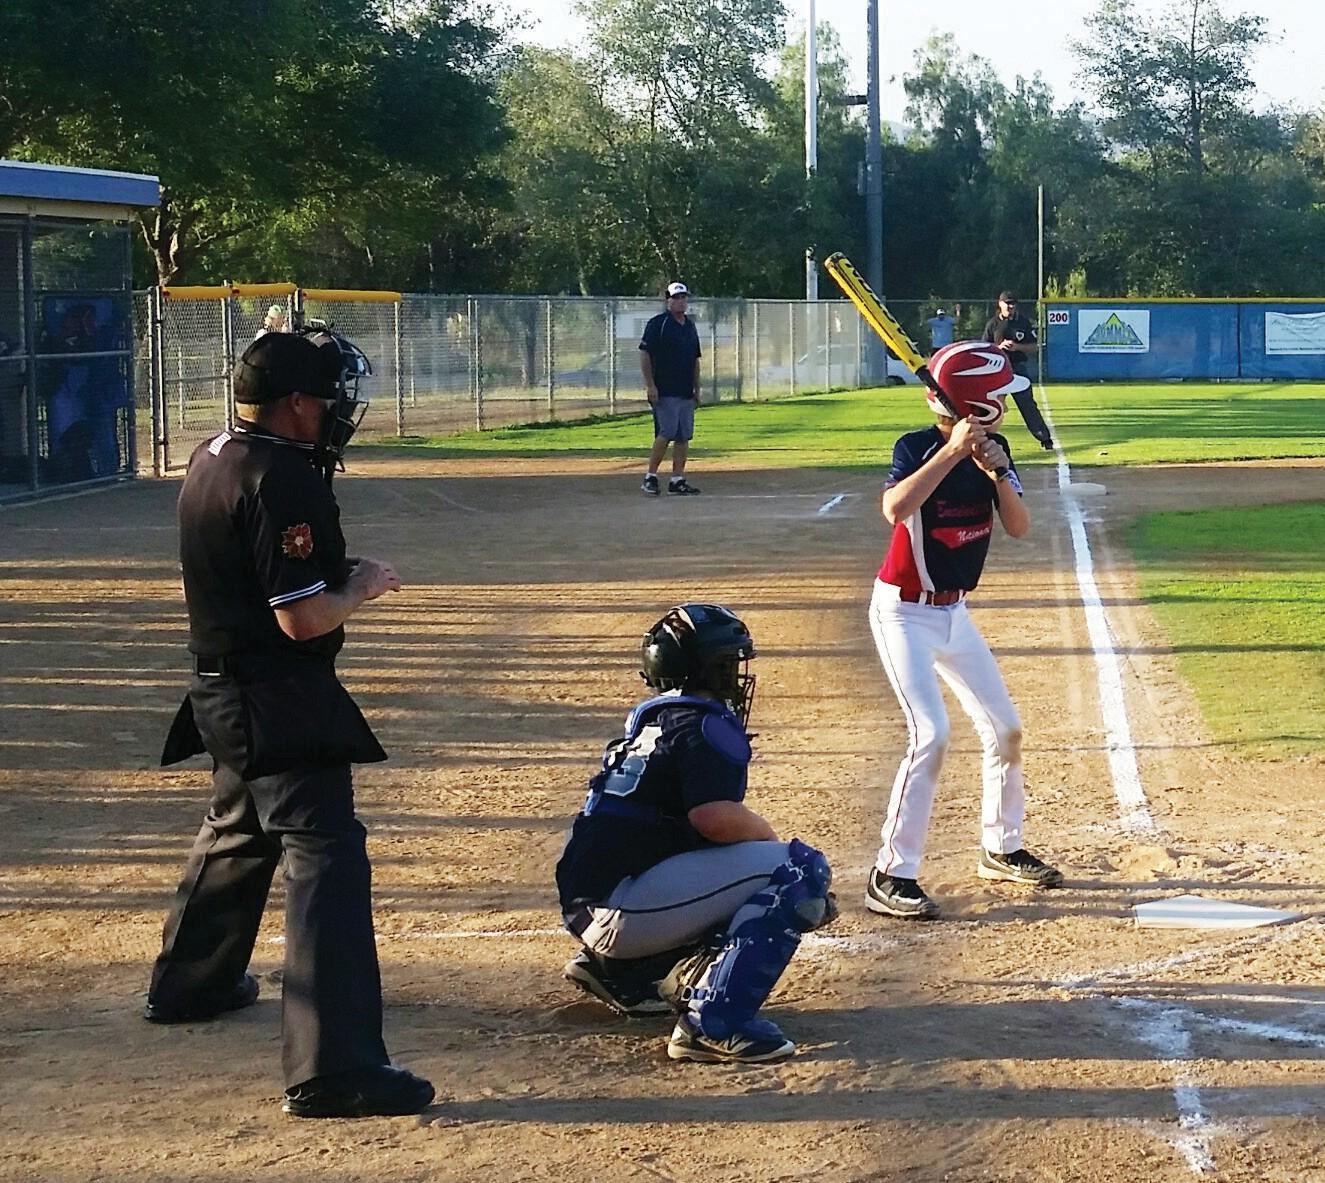 Little League action at Mountain View Park. Photo courtesy of National Little League.